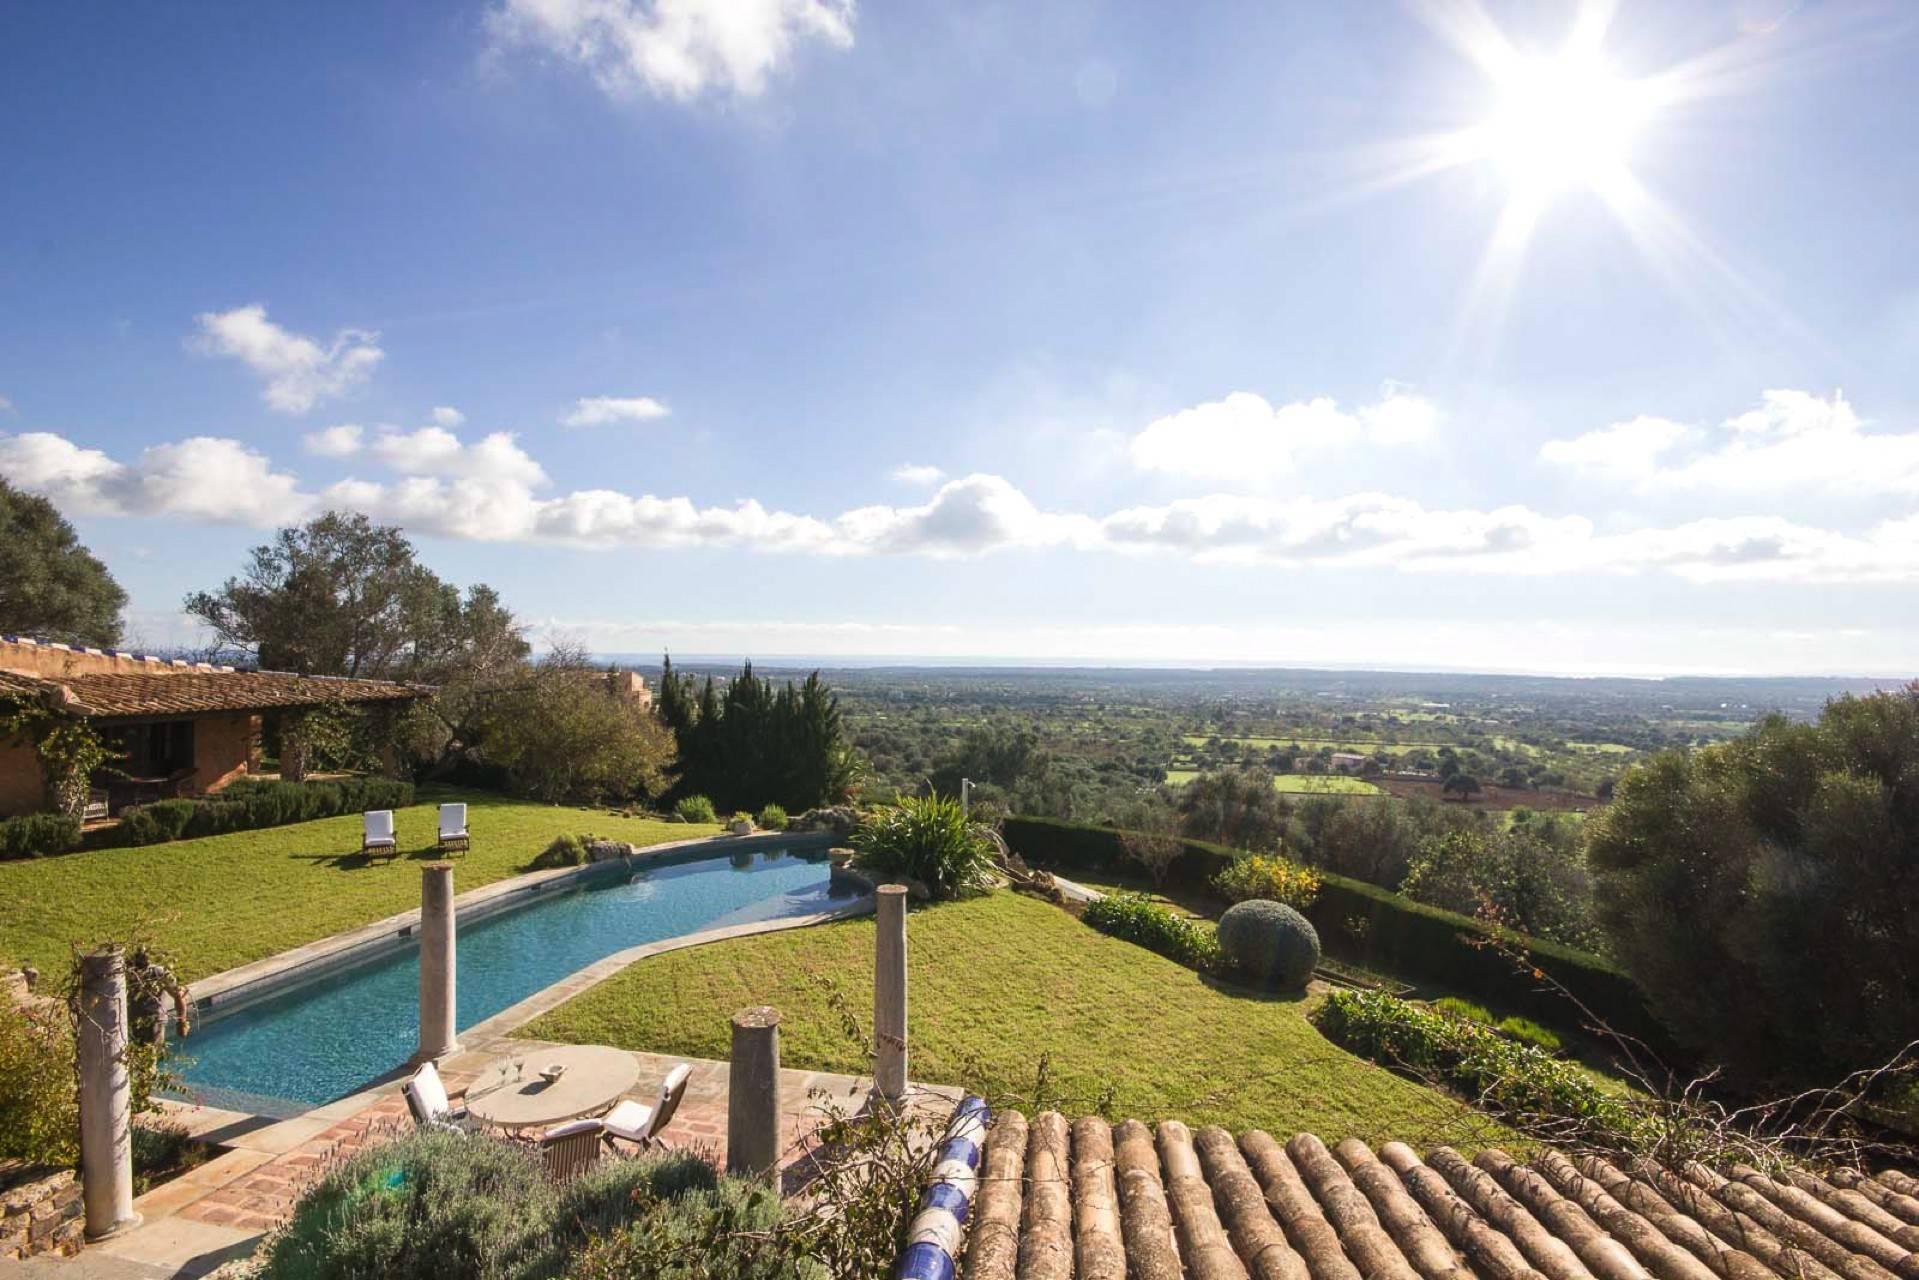 01-116 extravagante luxus Finca Mallorca Süden Bild 34